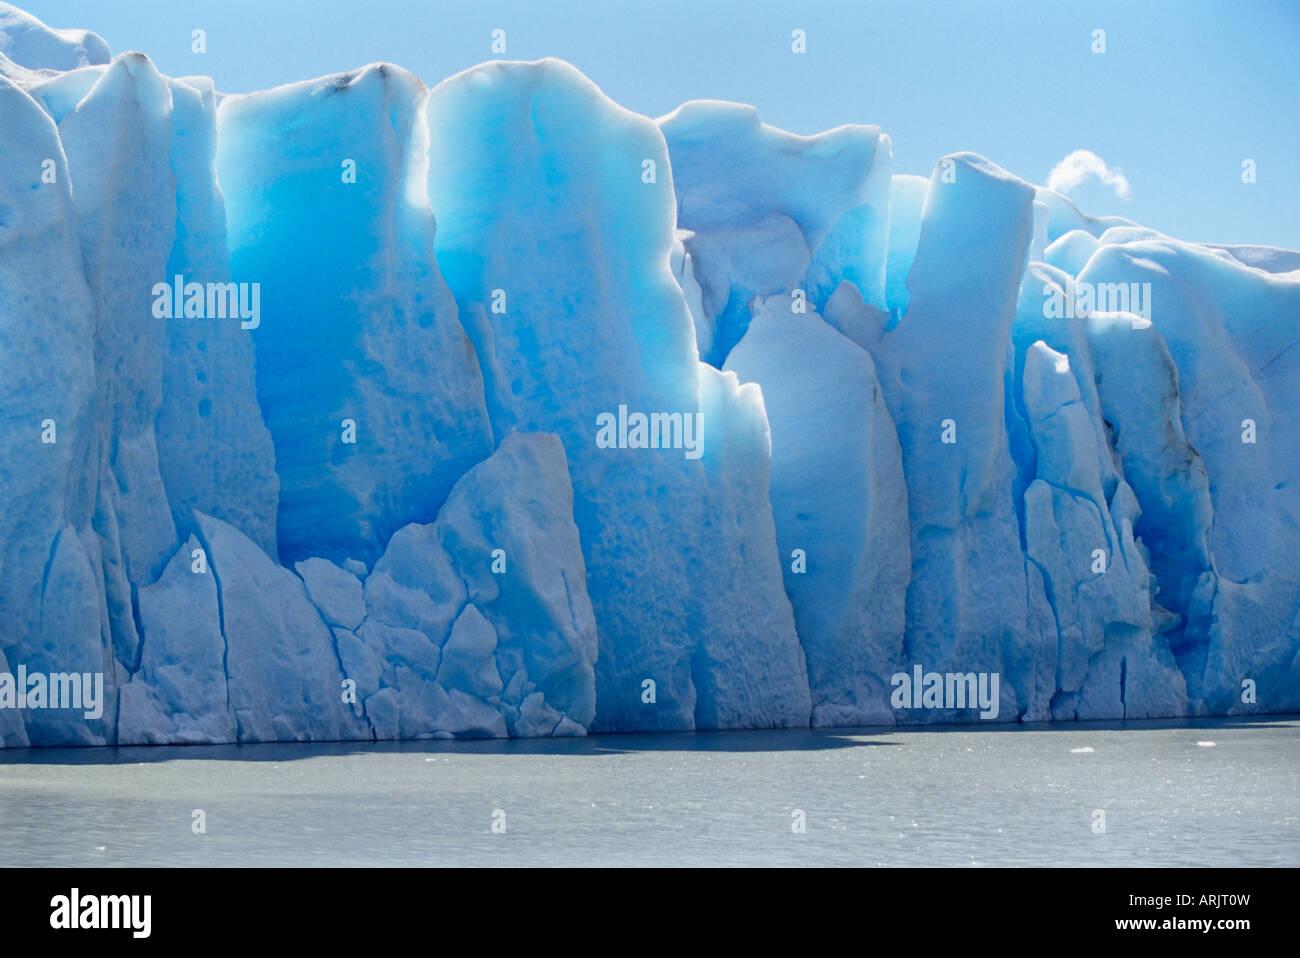 Eisberge, See grau, Torres del Paine Nationalpark, Patagonien, Chile, Südamerika Stockbild